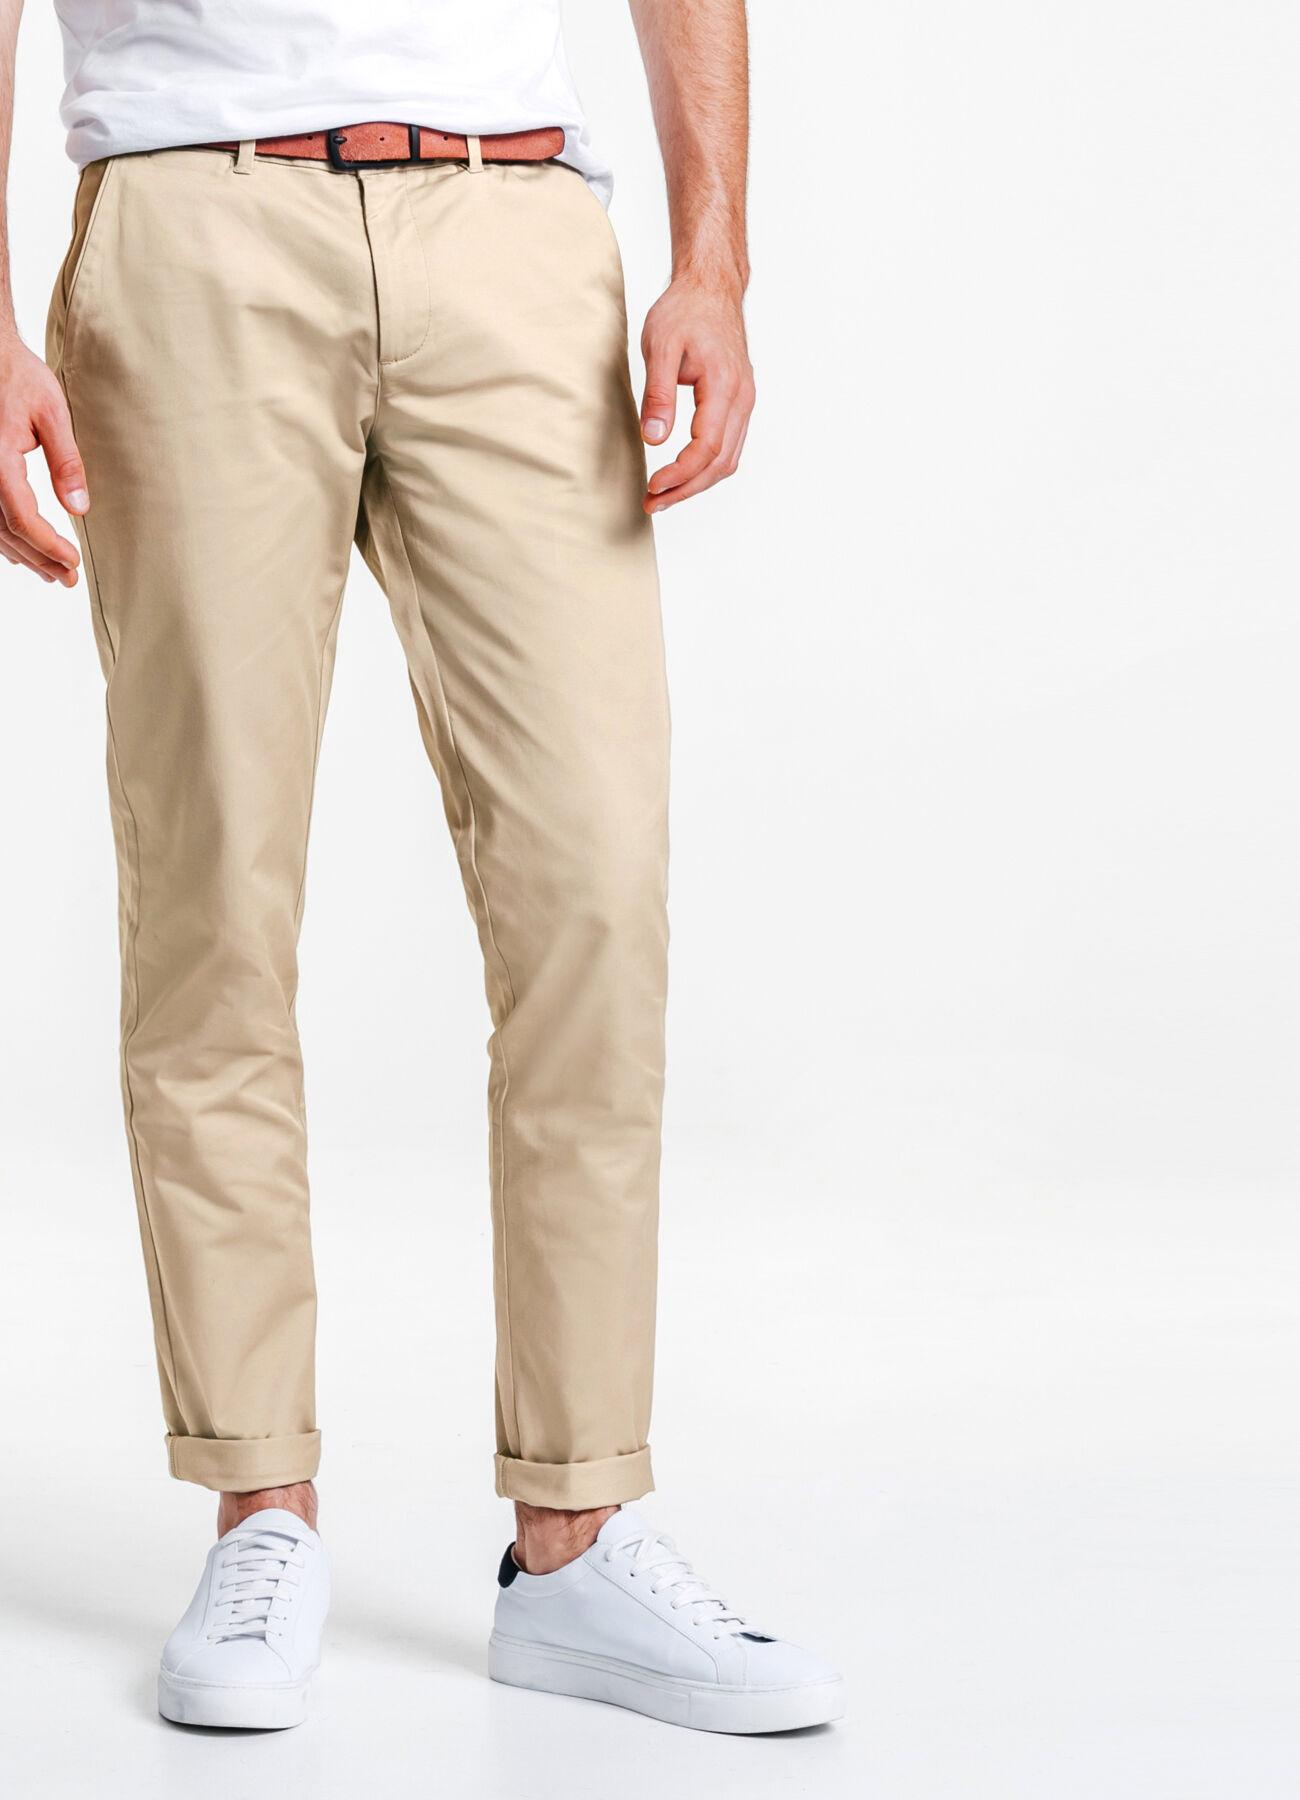 pantalon chino slim coton stretch beige homme jules. Black Bedroom Furniture Sets. Home Design Ideas